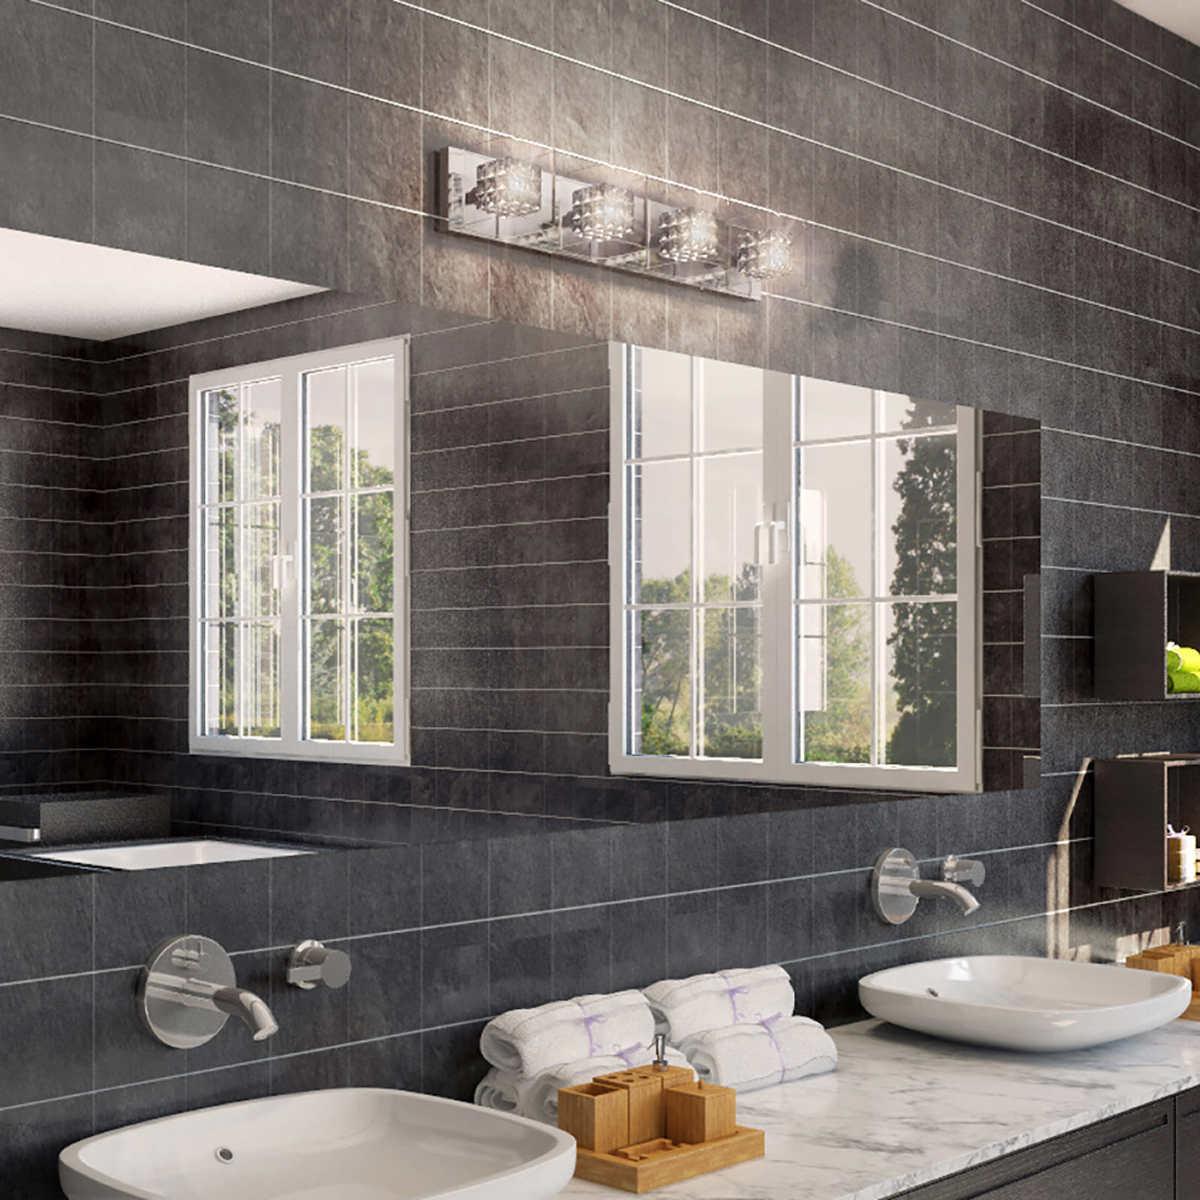 Costco bathroom lighting - Crystal Cubes 31 Light Fixture By Artika